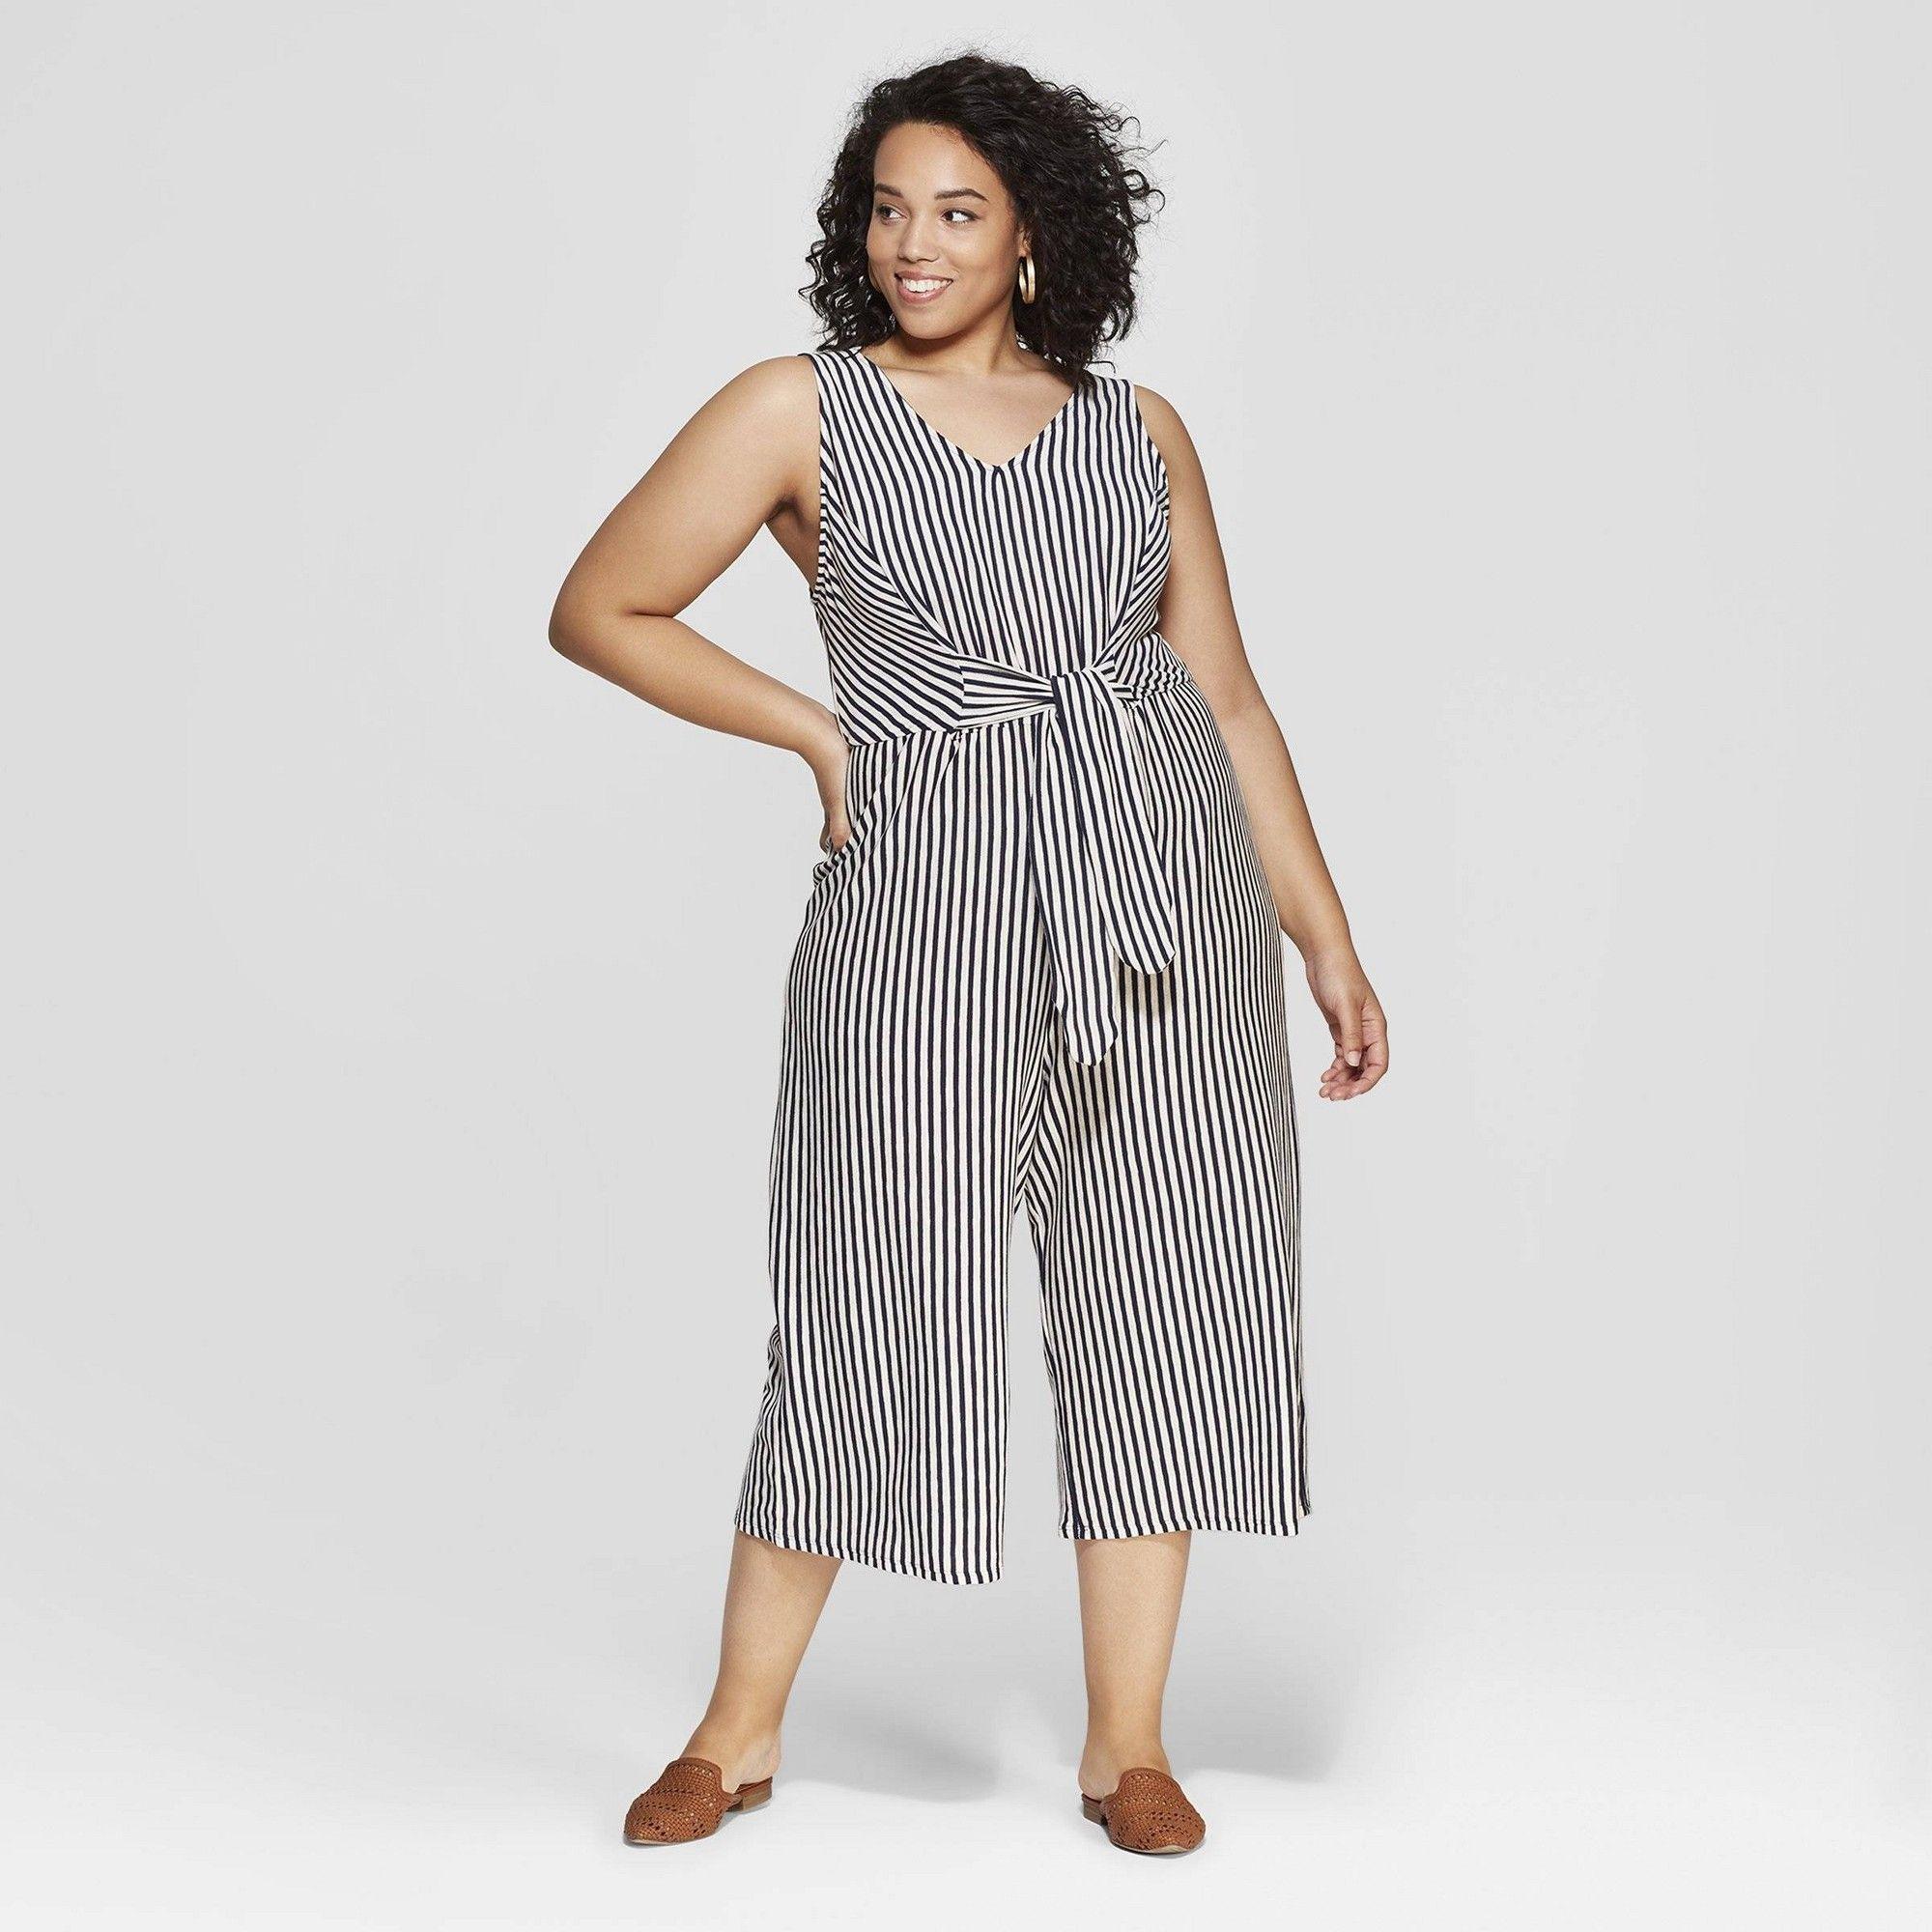 e4b276bdcf9b Women s Plus Size Striped Sleeveless V-Neck Tie Front Jumpsuit - Universal  Thread Blue 4X